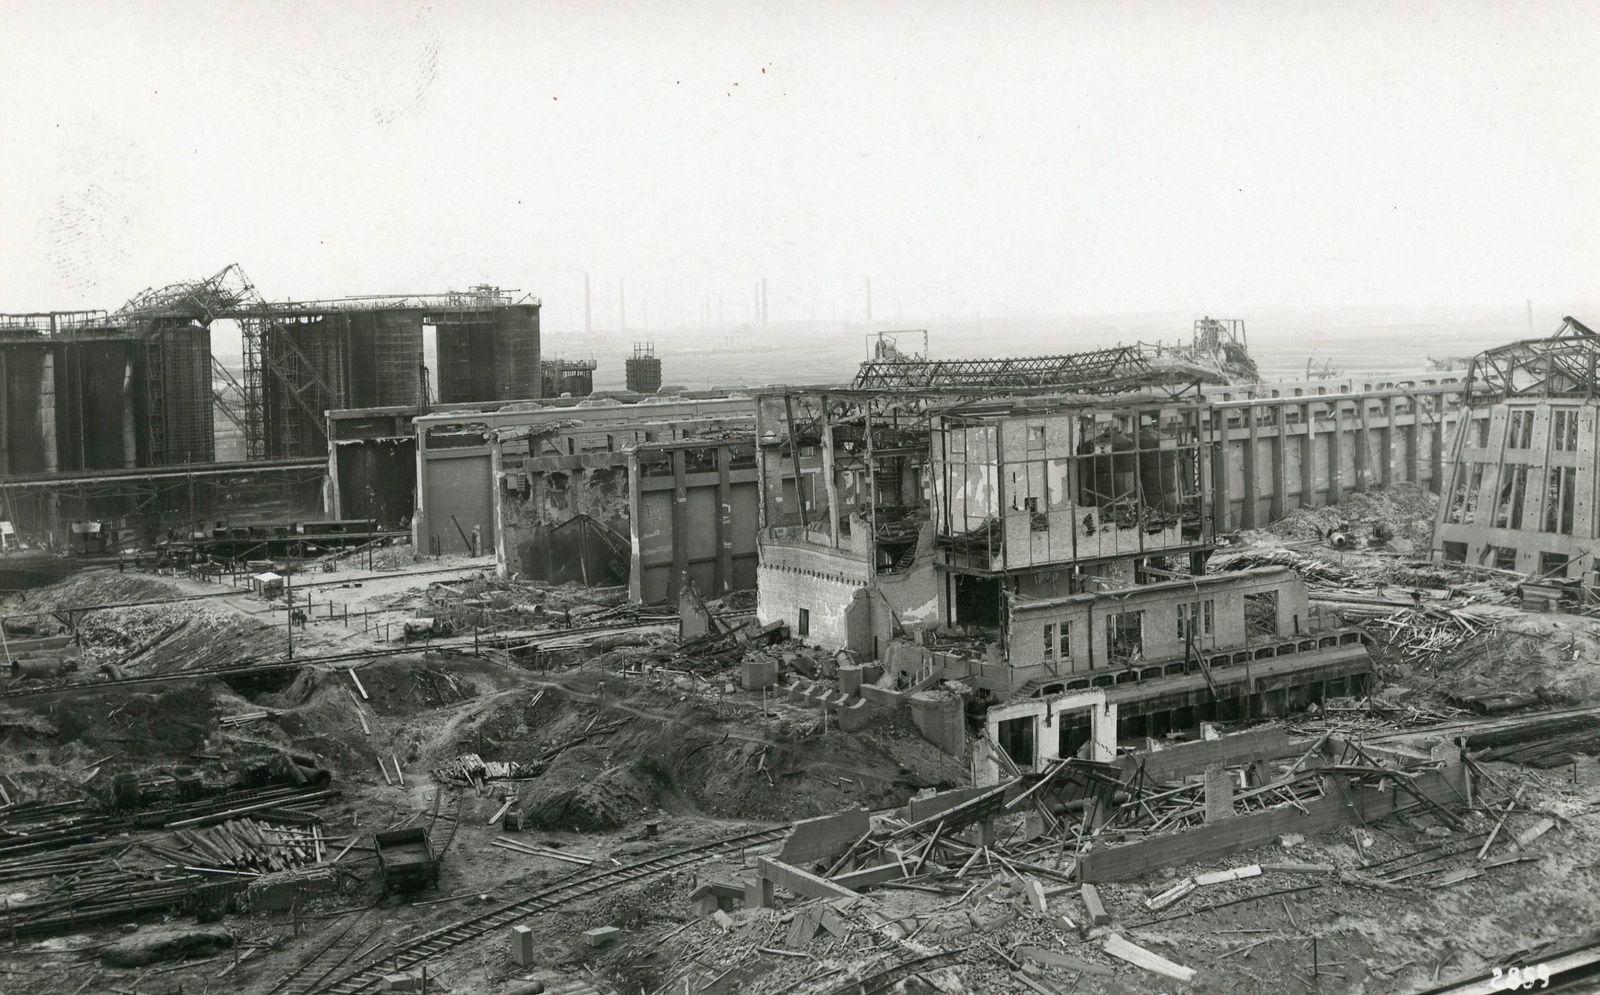 Oppau_zerstoerte_Gebaeude_1921